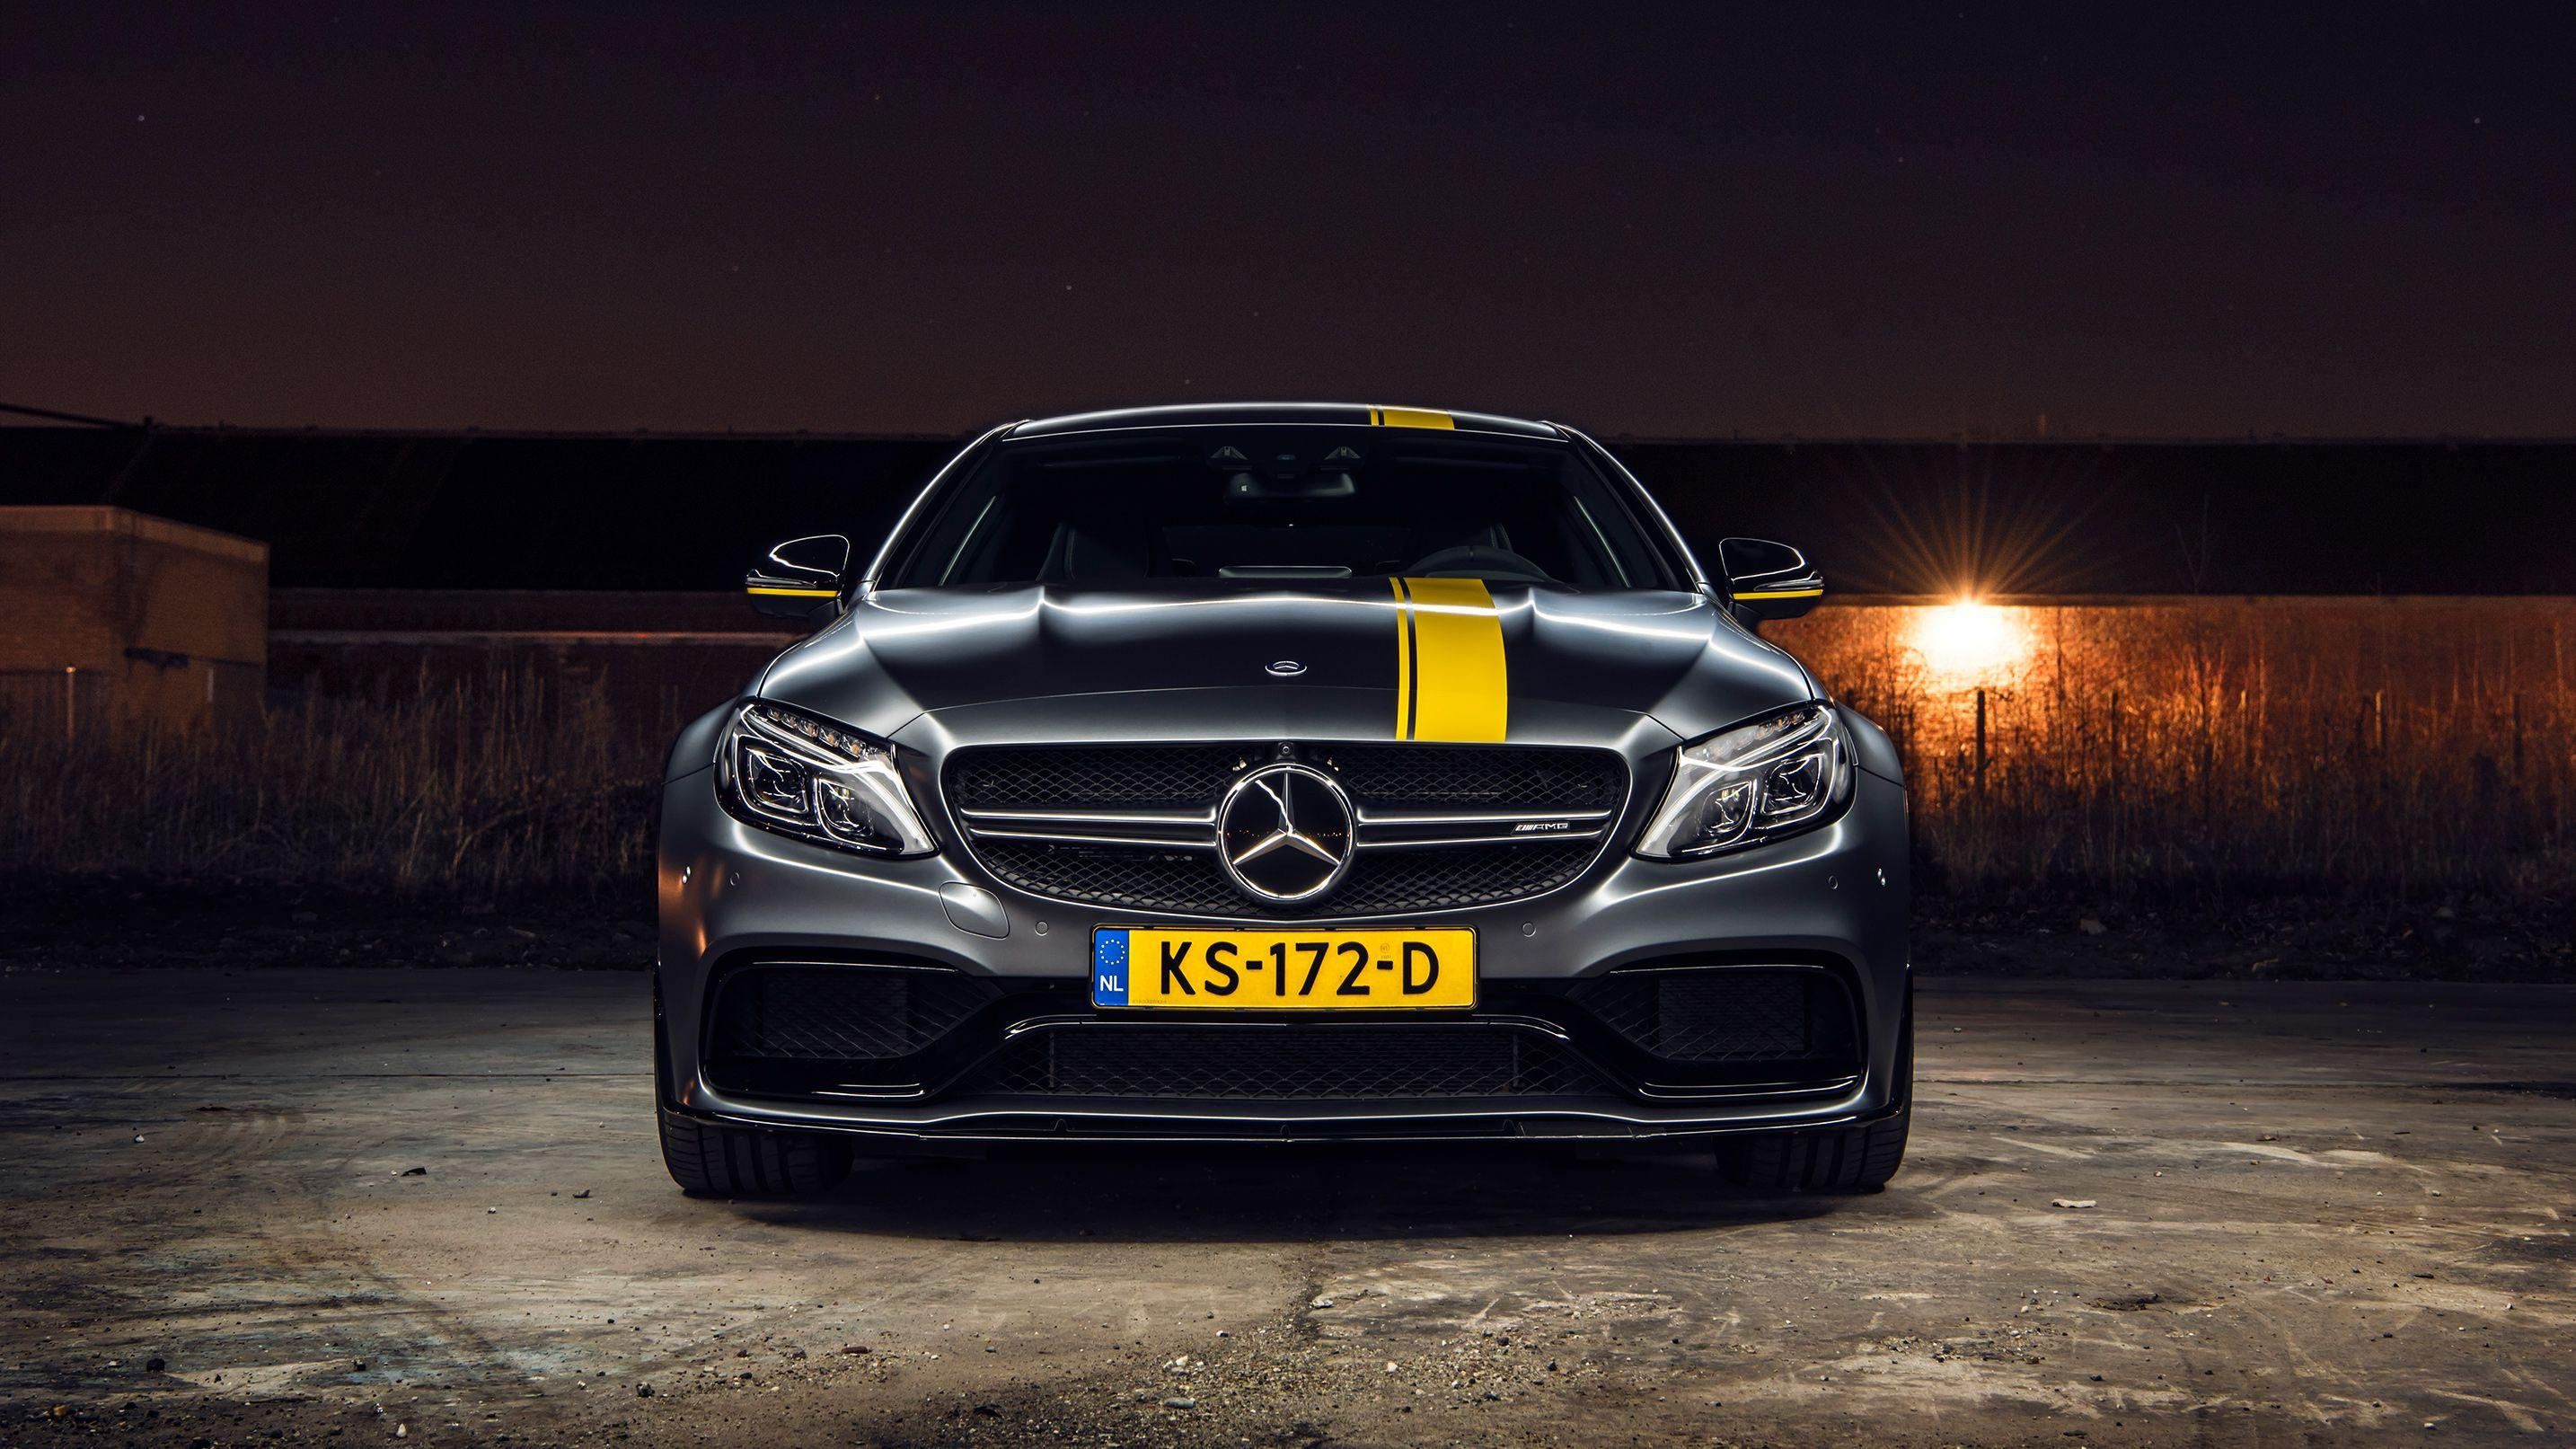 Mercedes-AMG C63 Wallpapers - Wallpaper Cave